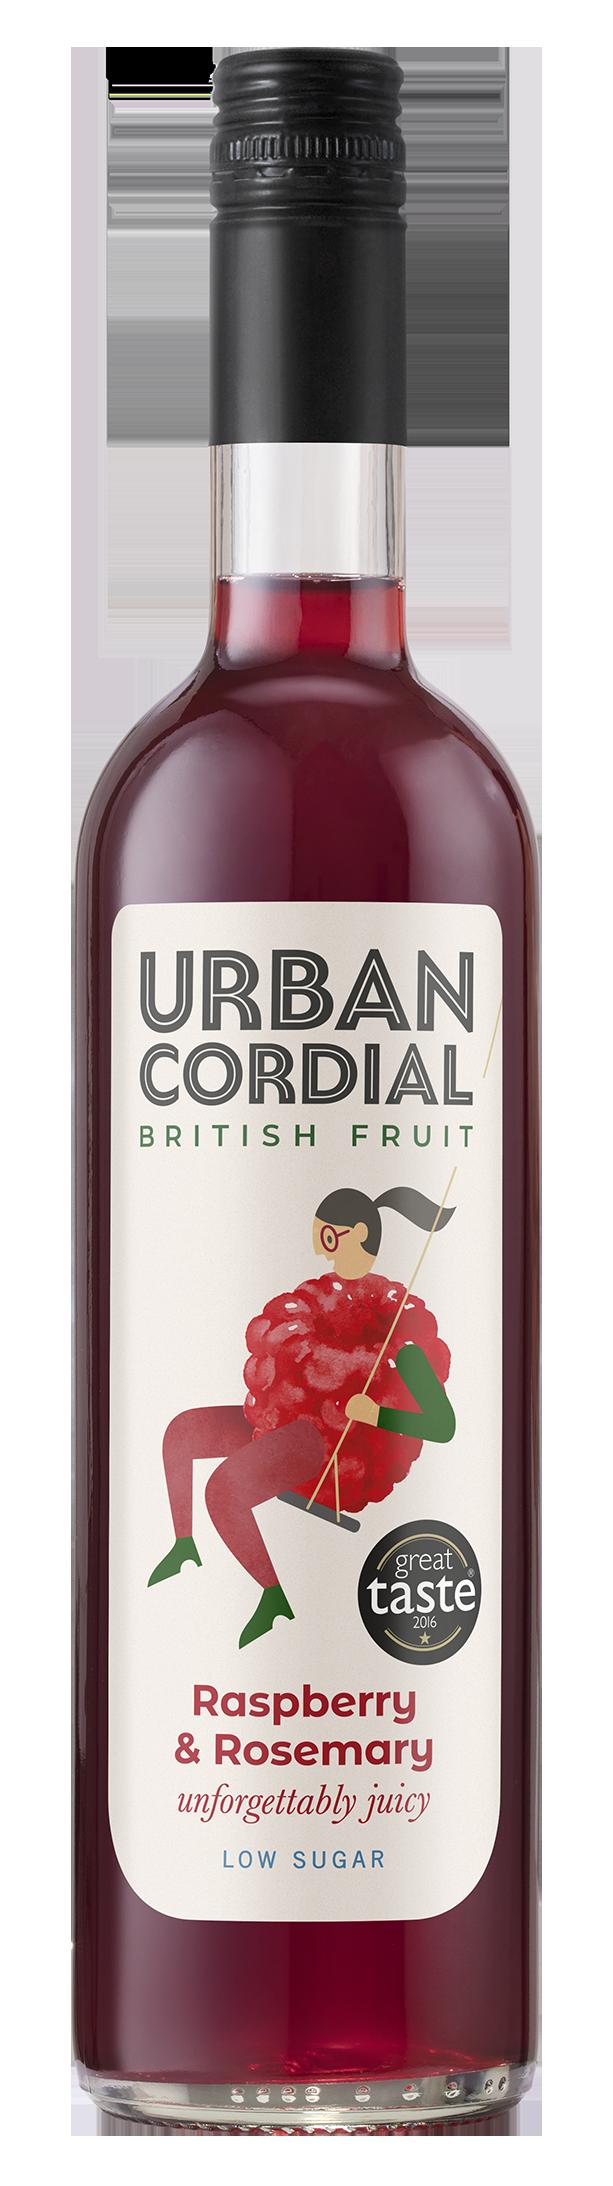 Raspberry & Rosemary Cordial by Urban Cordials 500ml